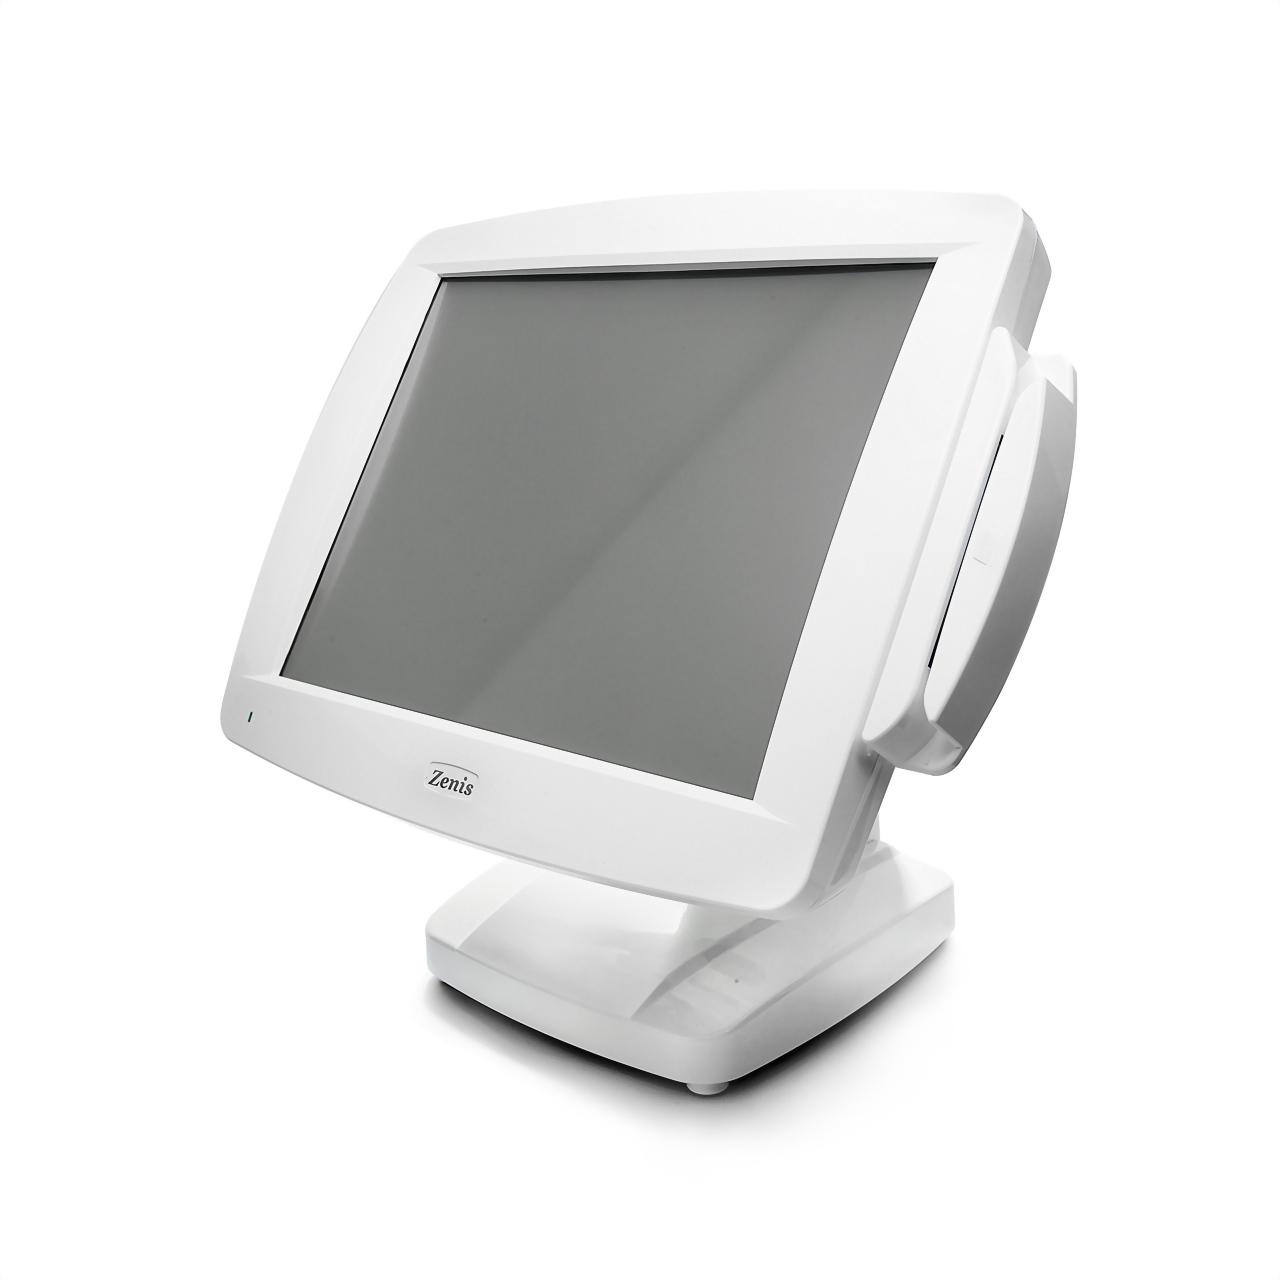 POS Systems POS-3000-i